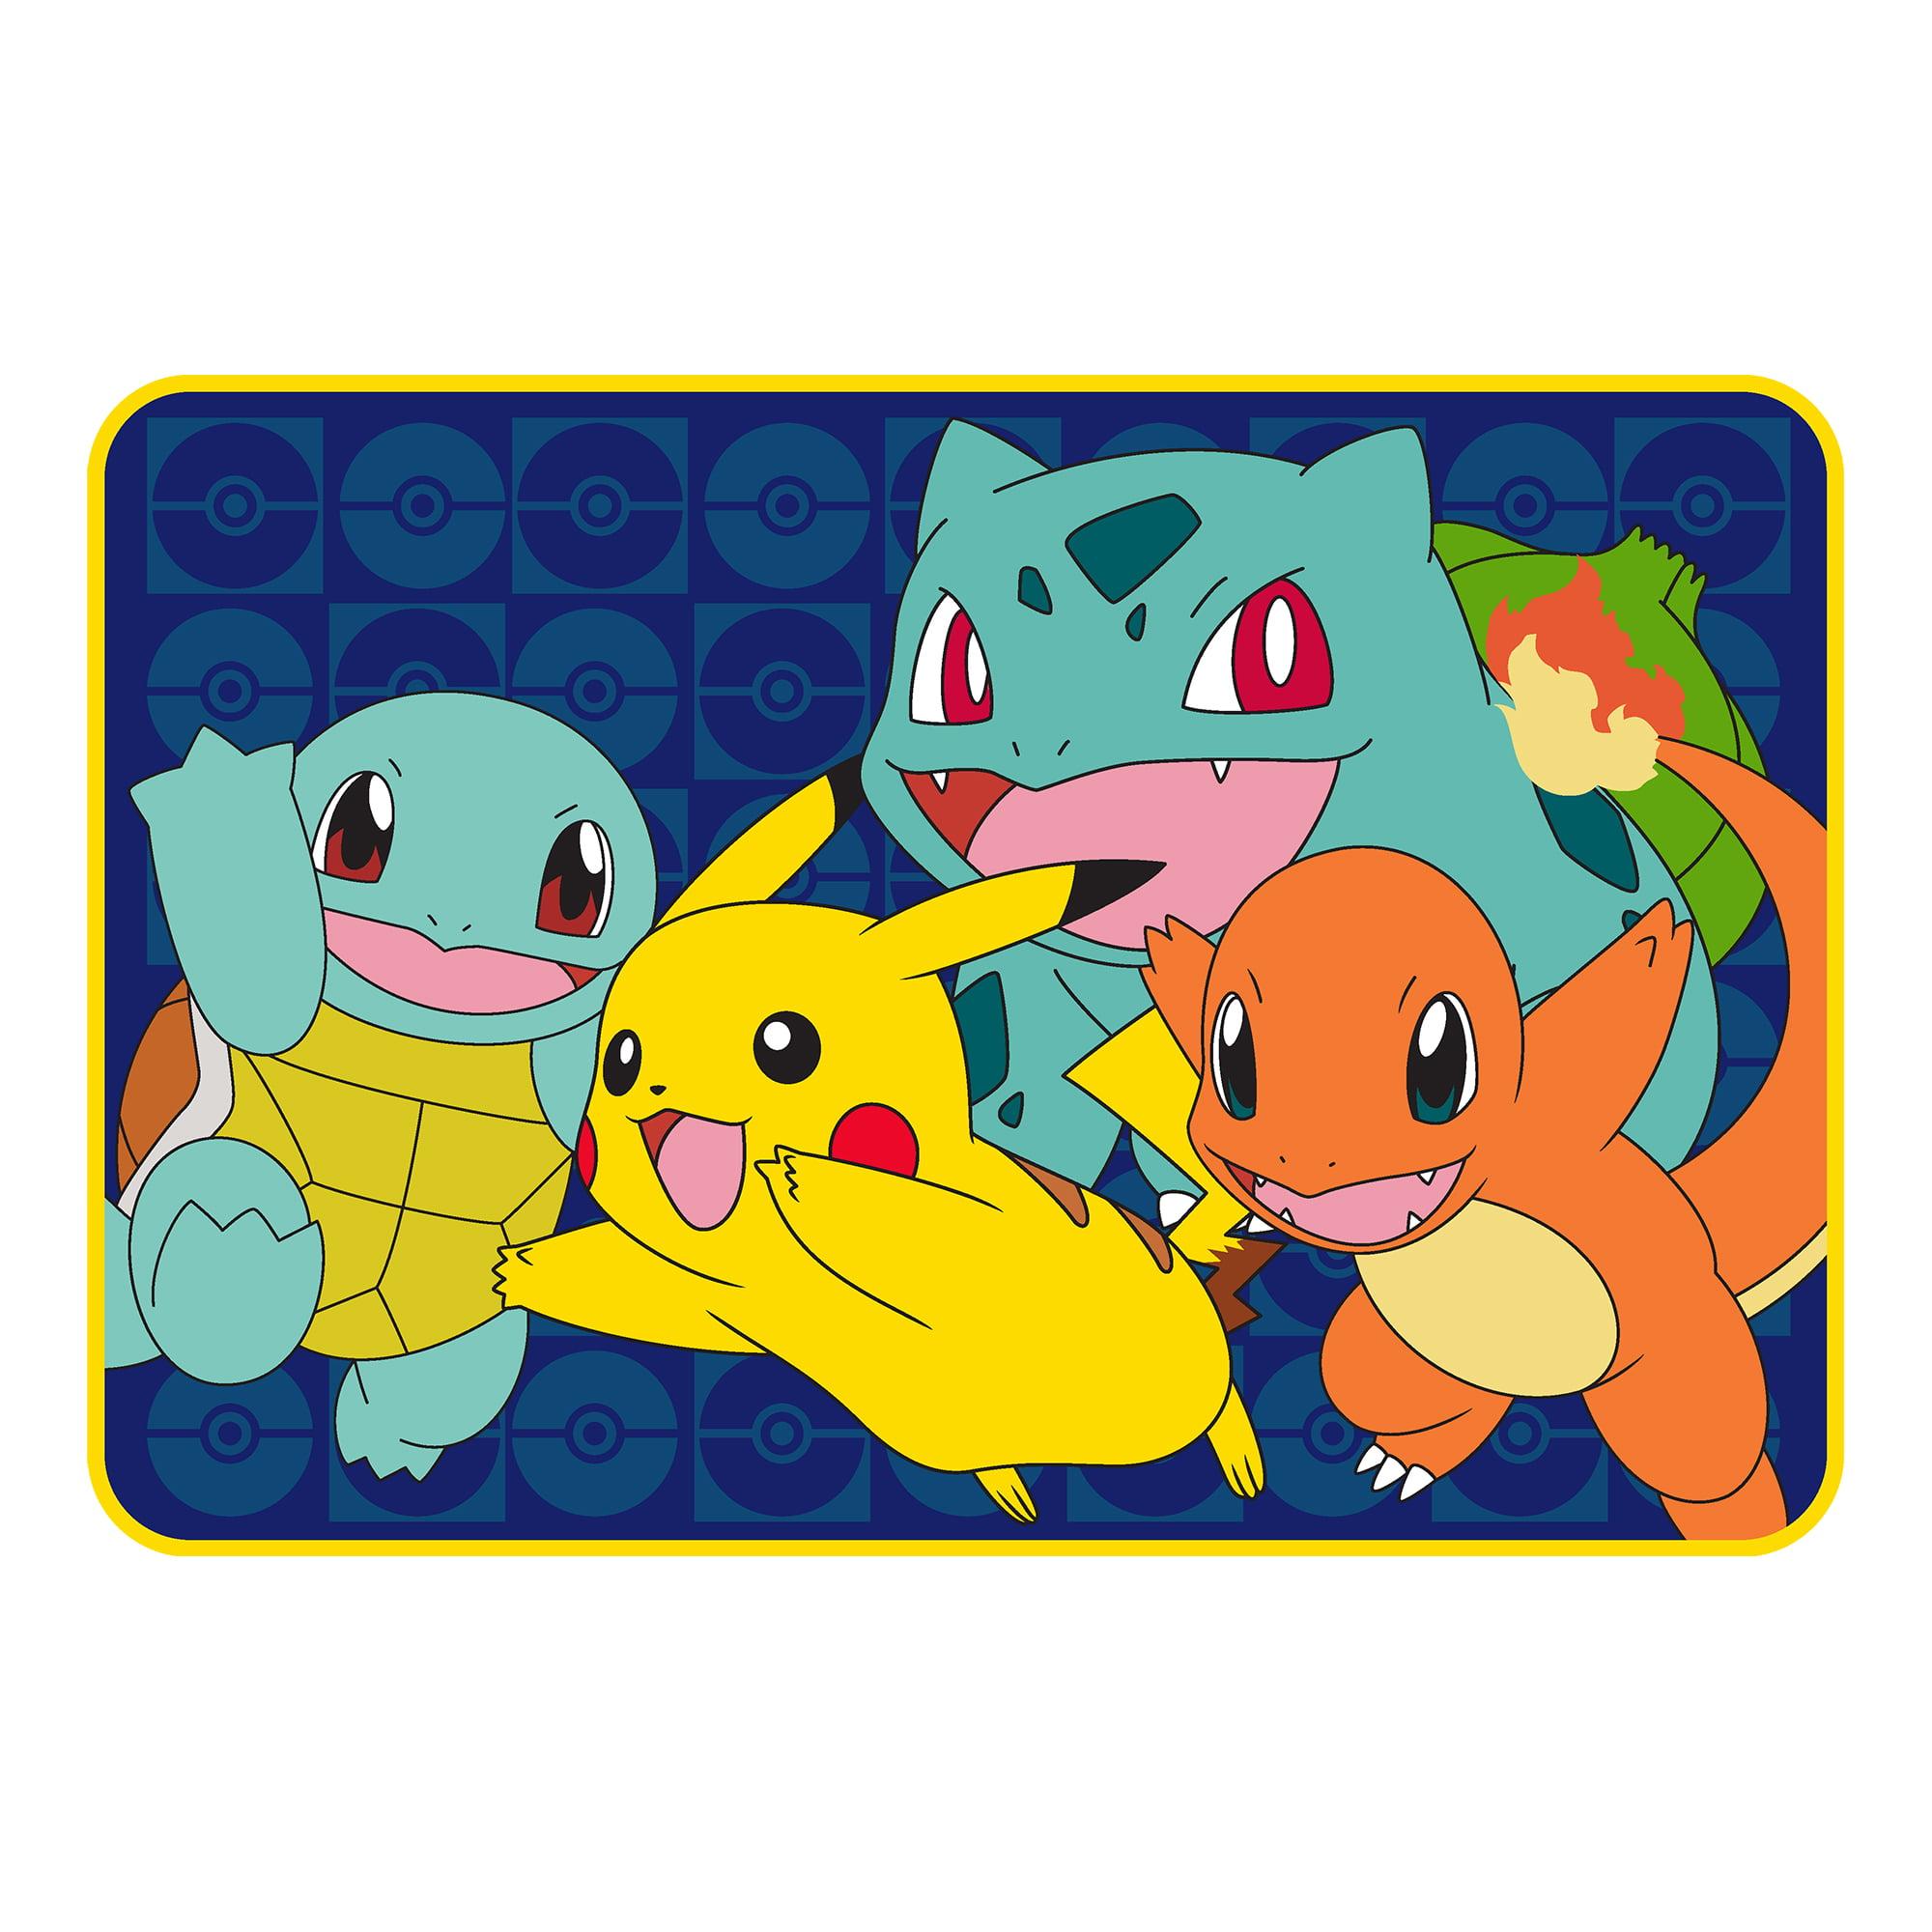 Pokemon u0022I Choose Youu0022 Foam Bath Rug, 1 Each